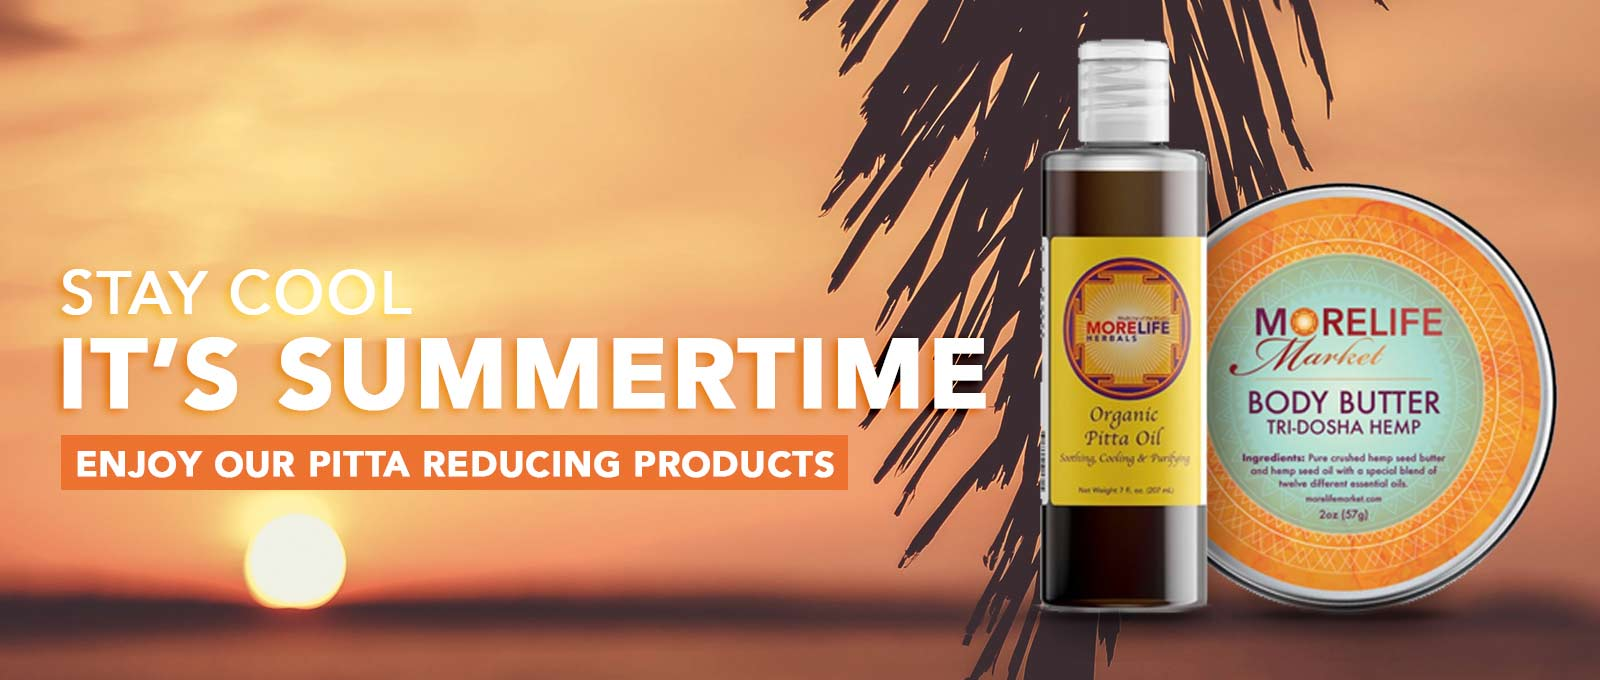 summertime beach palm pitta body oil